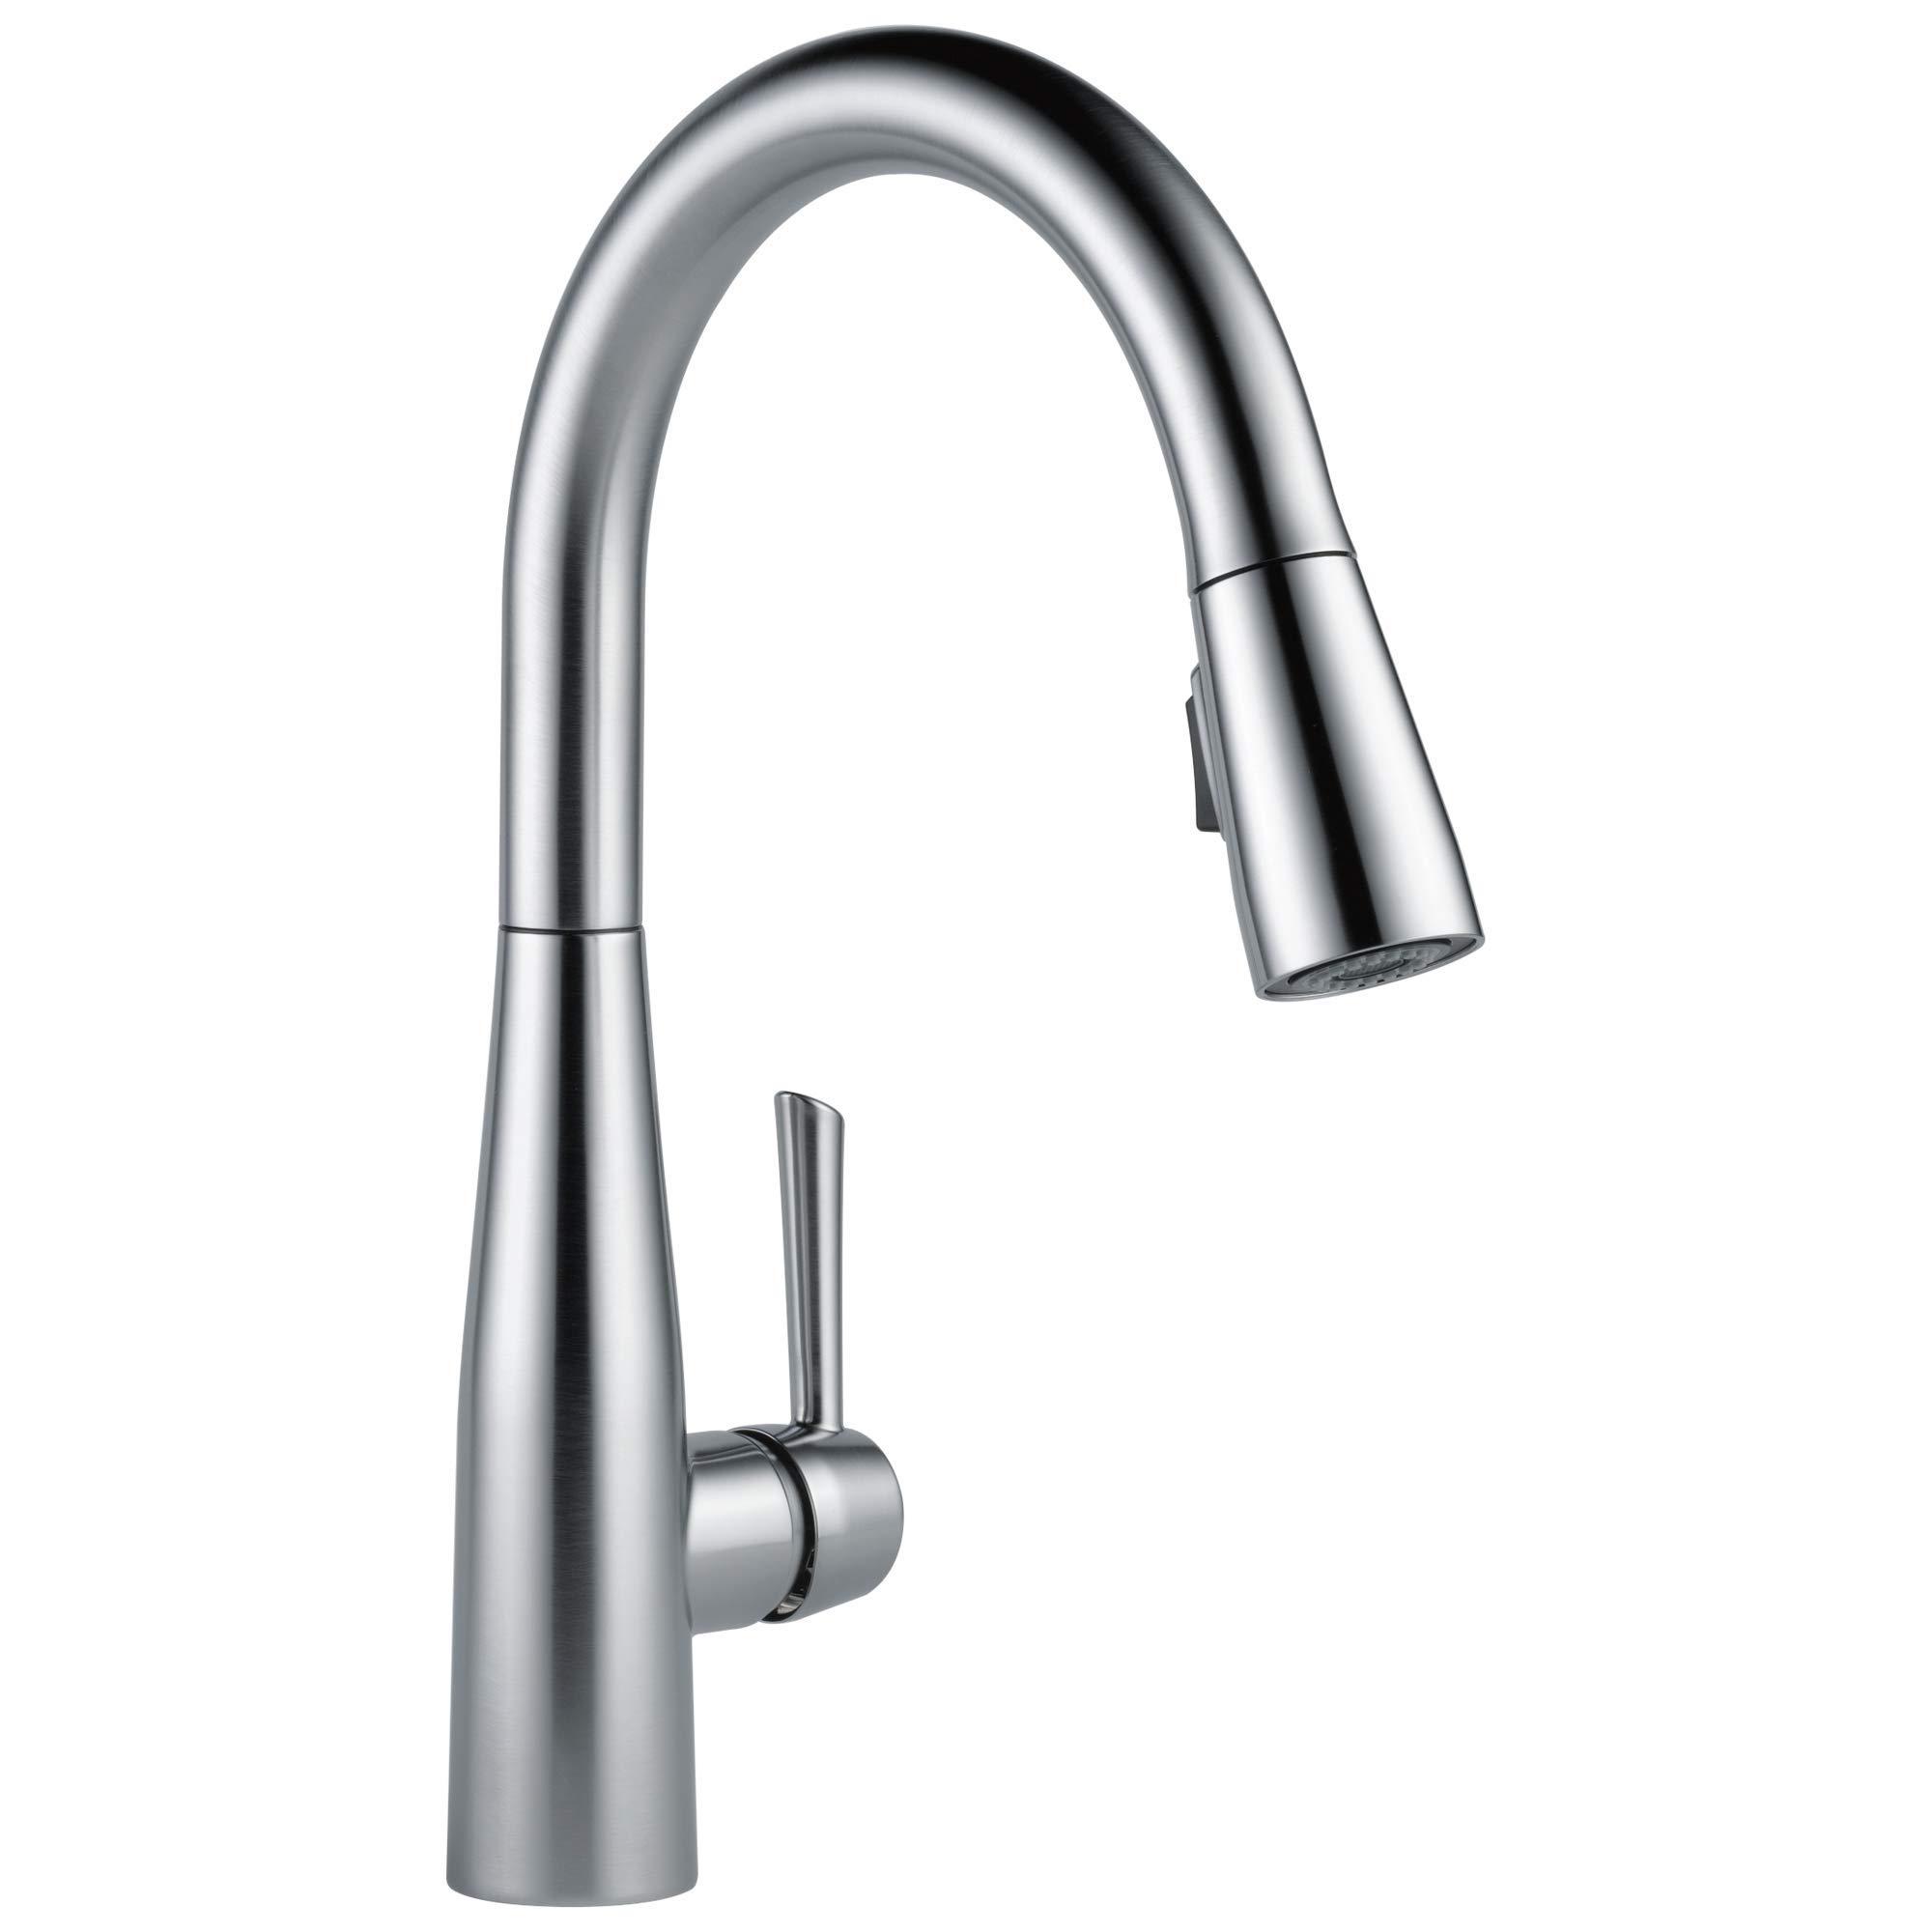 Delta Faucet Essa Pull Down Kitchen Faucet with Pull Down Sprayer, Kitchen Sink Faucet, Faucets for Kitchen Sinks, Single-...